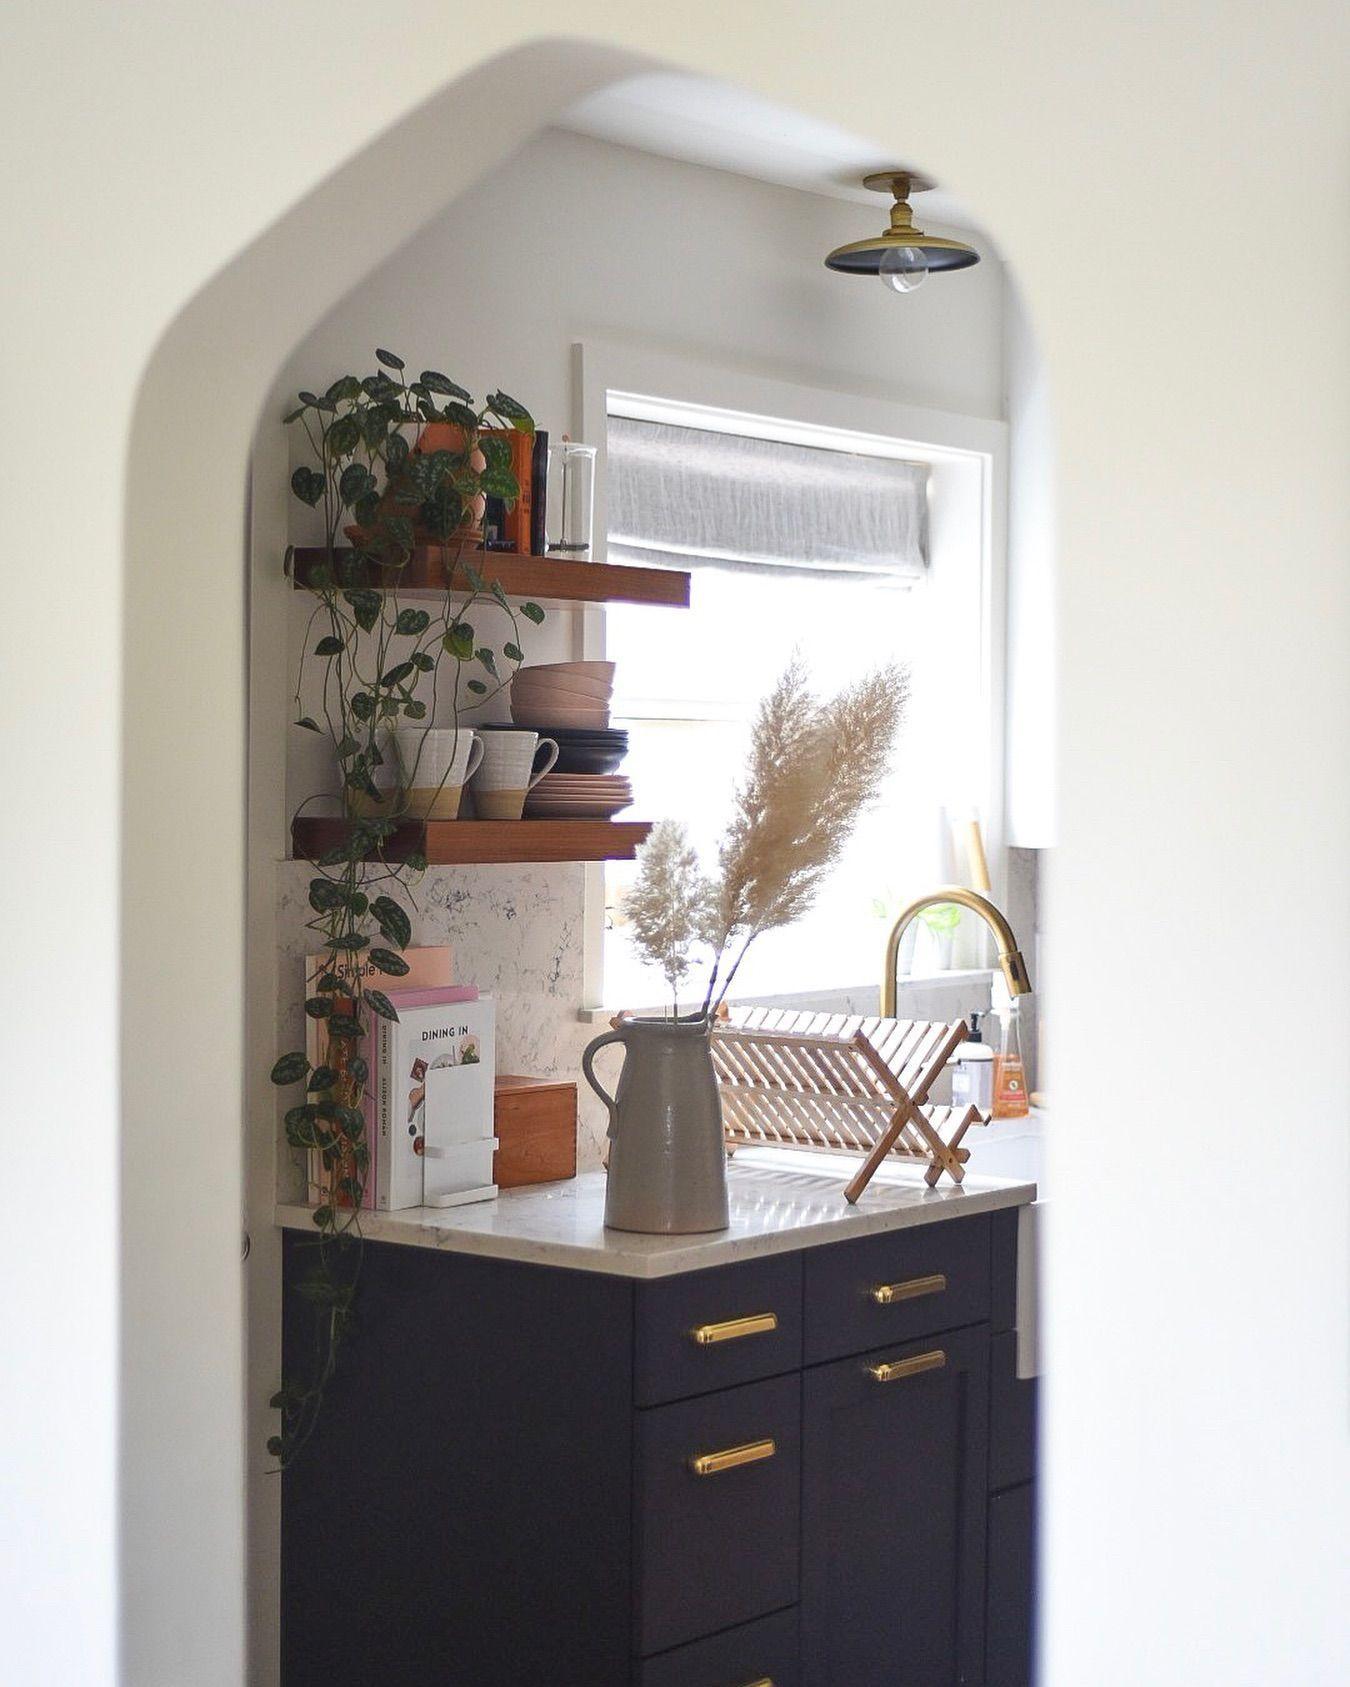 Period Kitchens Designs Renovation: Kitchen Remodeling Projects, Kitchen Interior